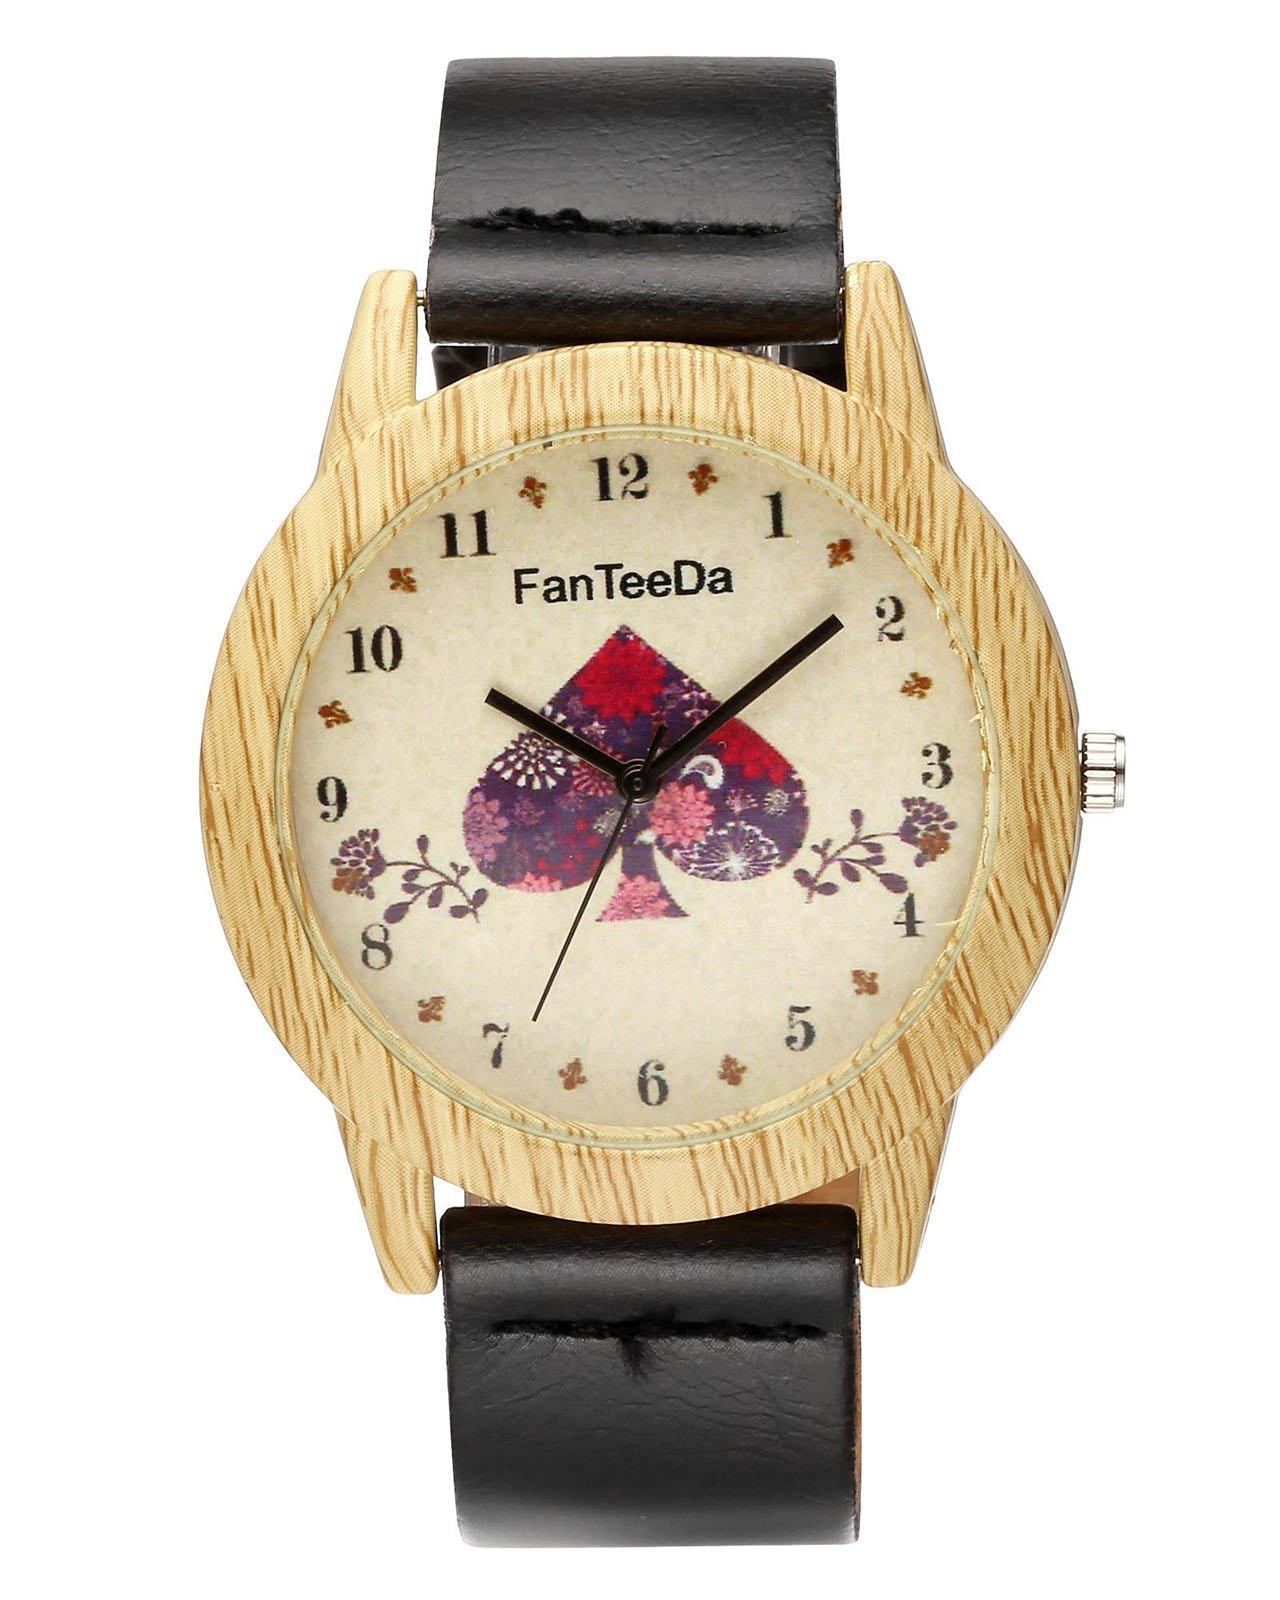 JSDDE Uhren,Vintage Holz-Muster Herz Armbanduhr Damenuhr Kleid Uhr PU Lederarmband Analog Quarzuhr,Schwarz